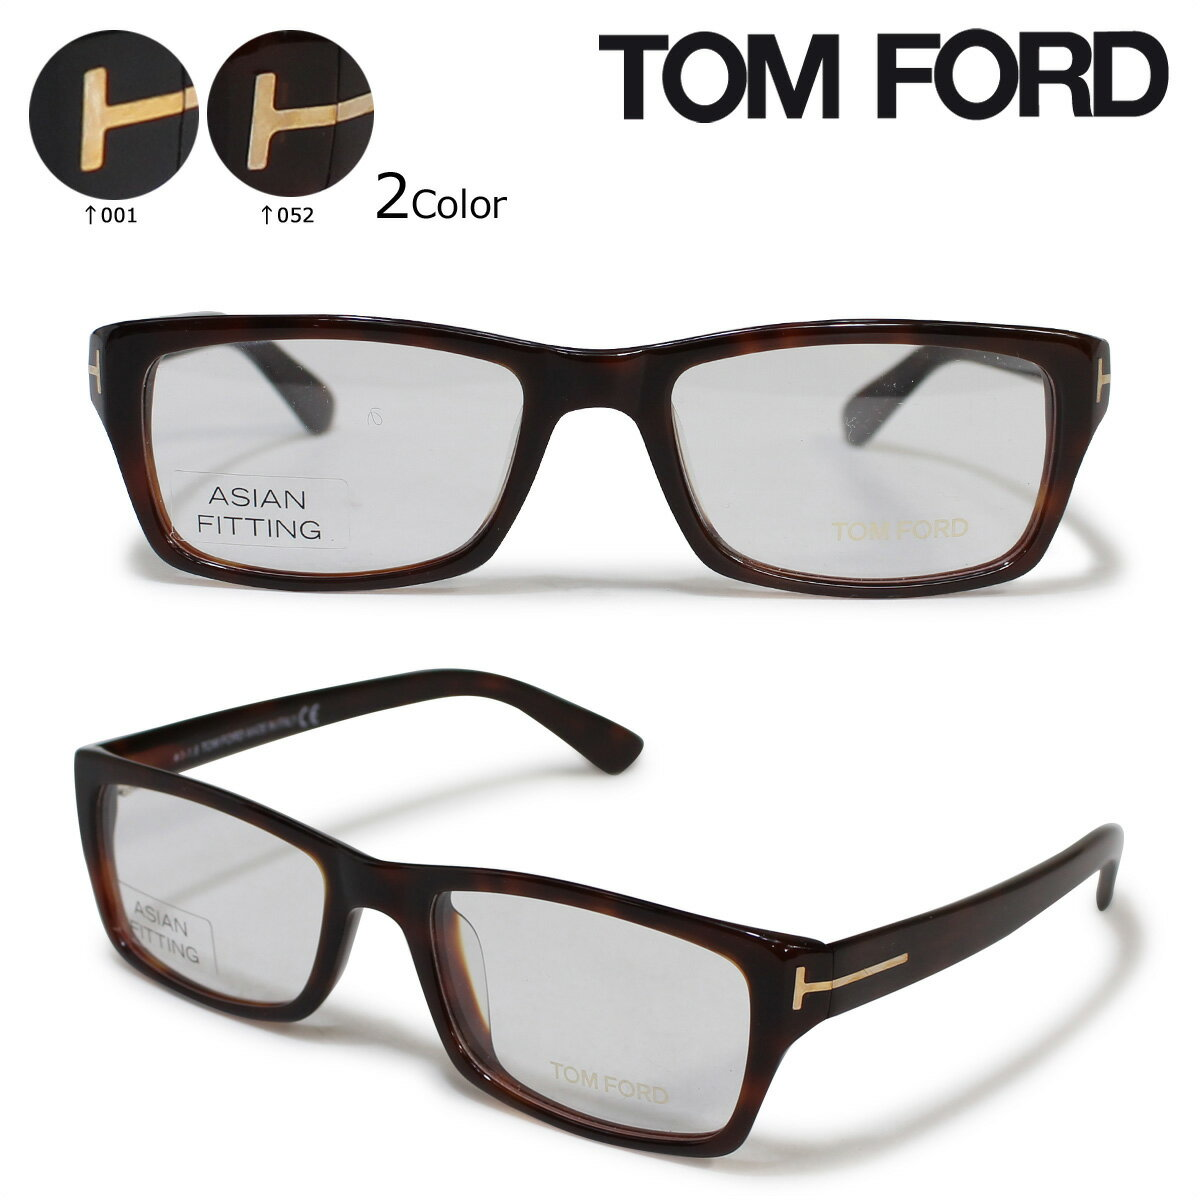 TOM FORD ASIAN FITTING FT4239 トムフォード メガネ 眼鏡 メンズ レディース アイウェア イタリア製 【決算セール】